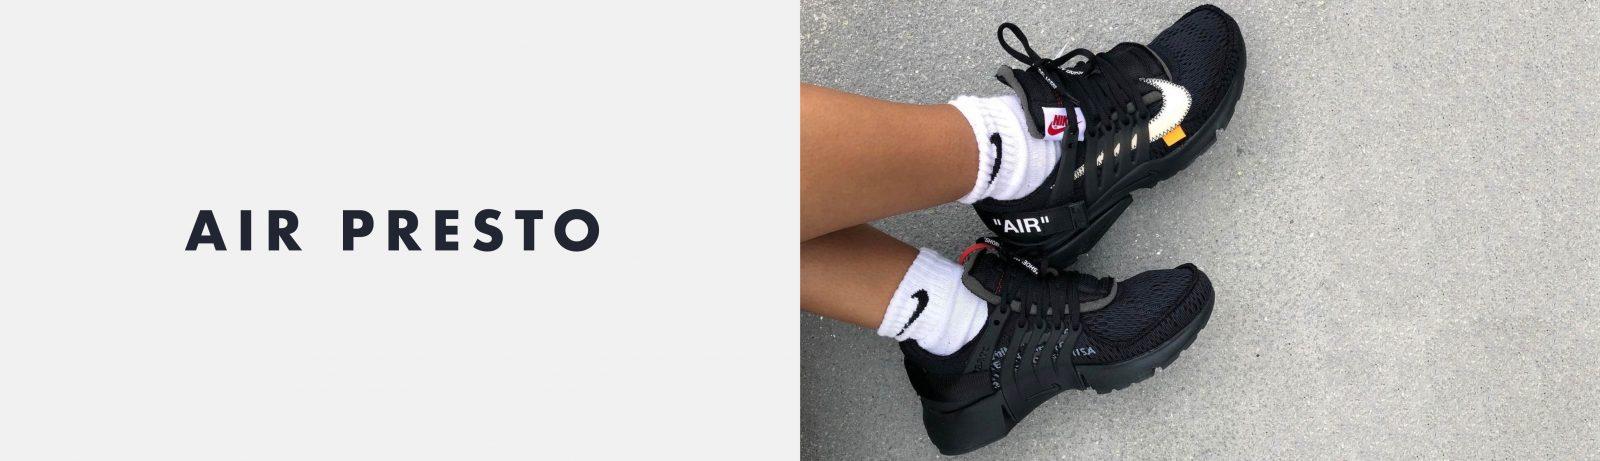 Women's Nike Air Presto Trainers